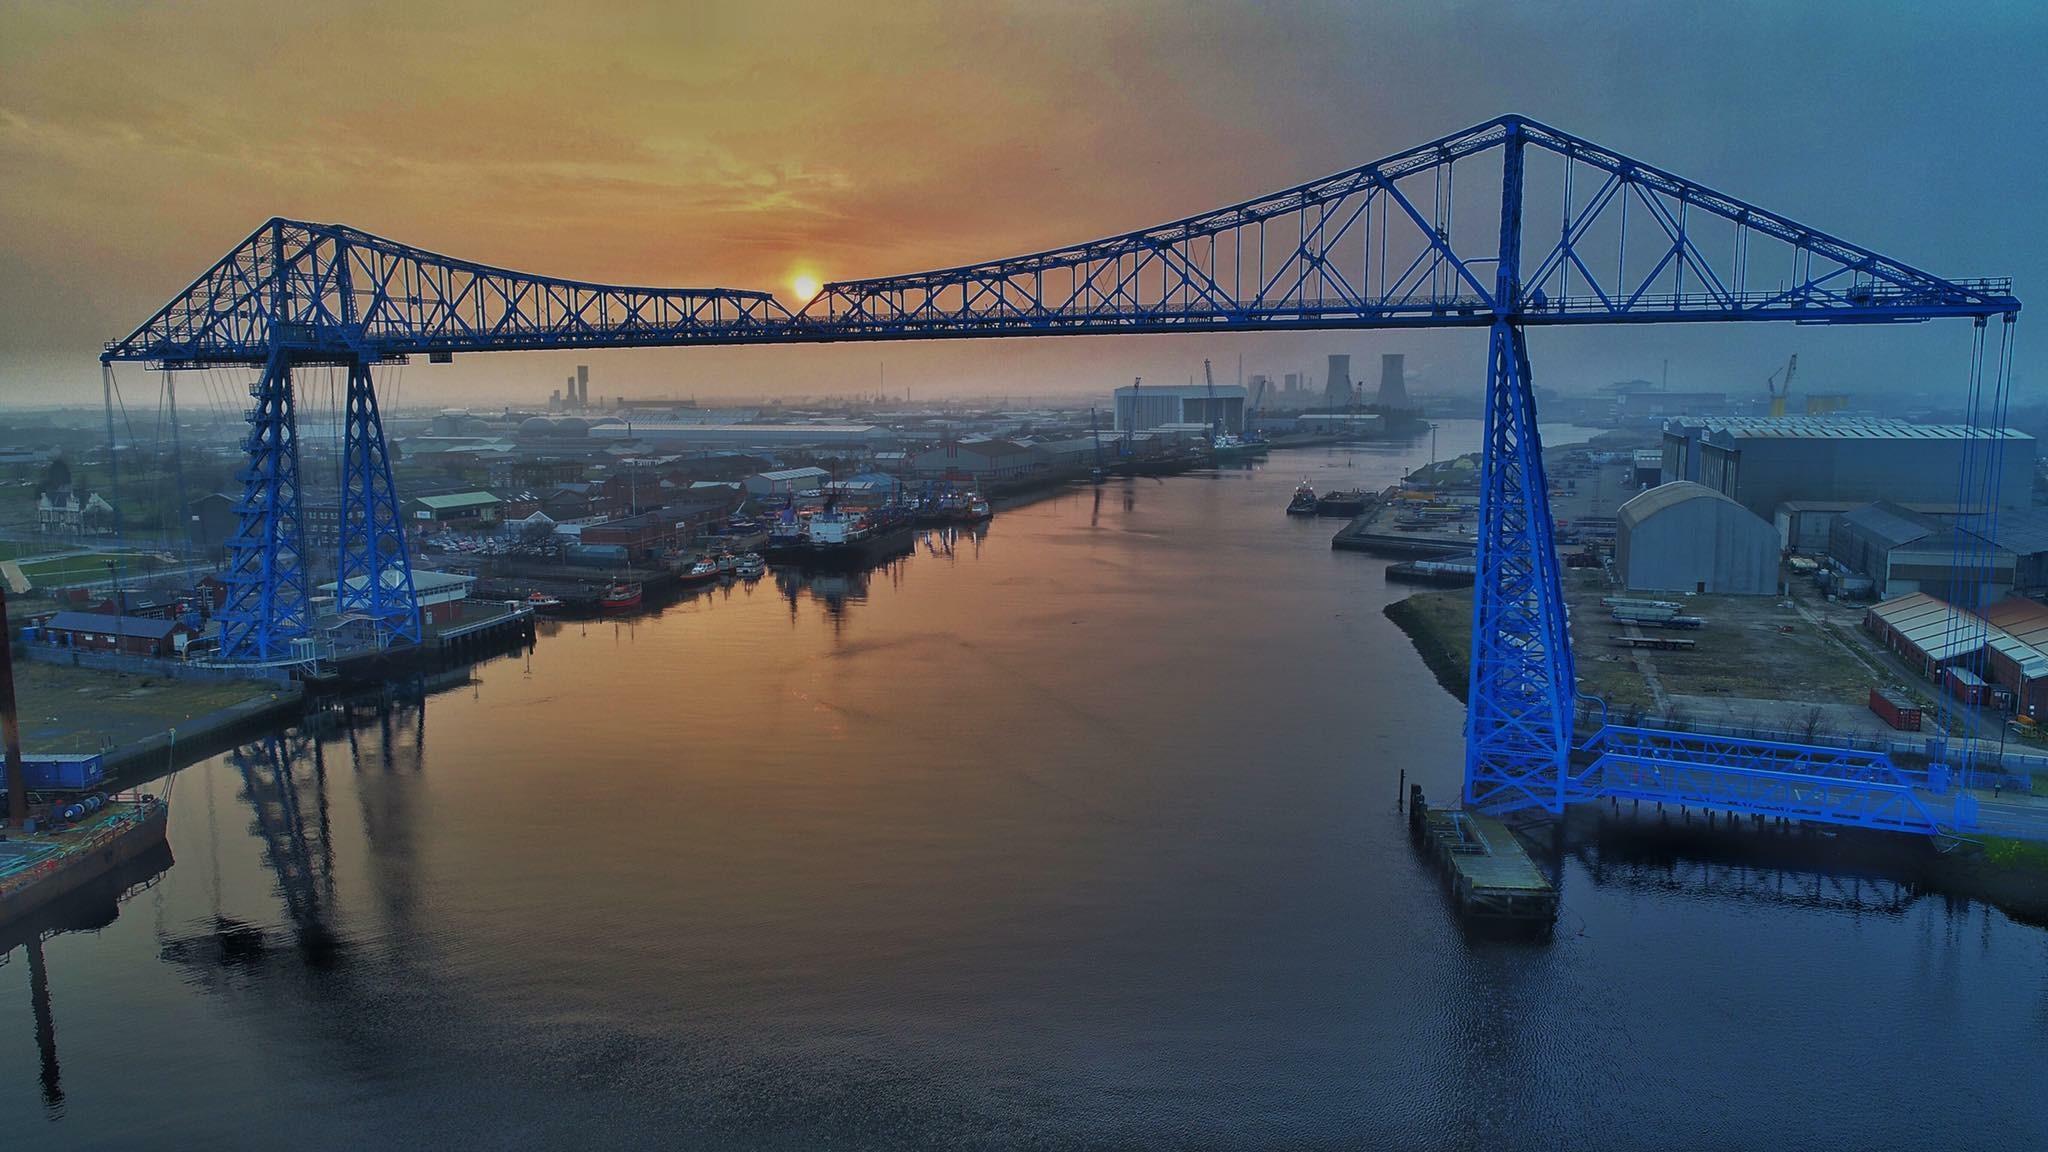 Middlesbrough Transporter Bridge Decking Core 6 Composites